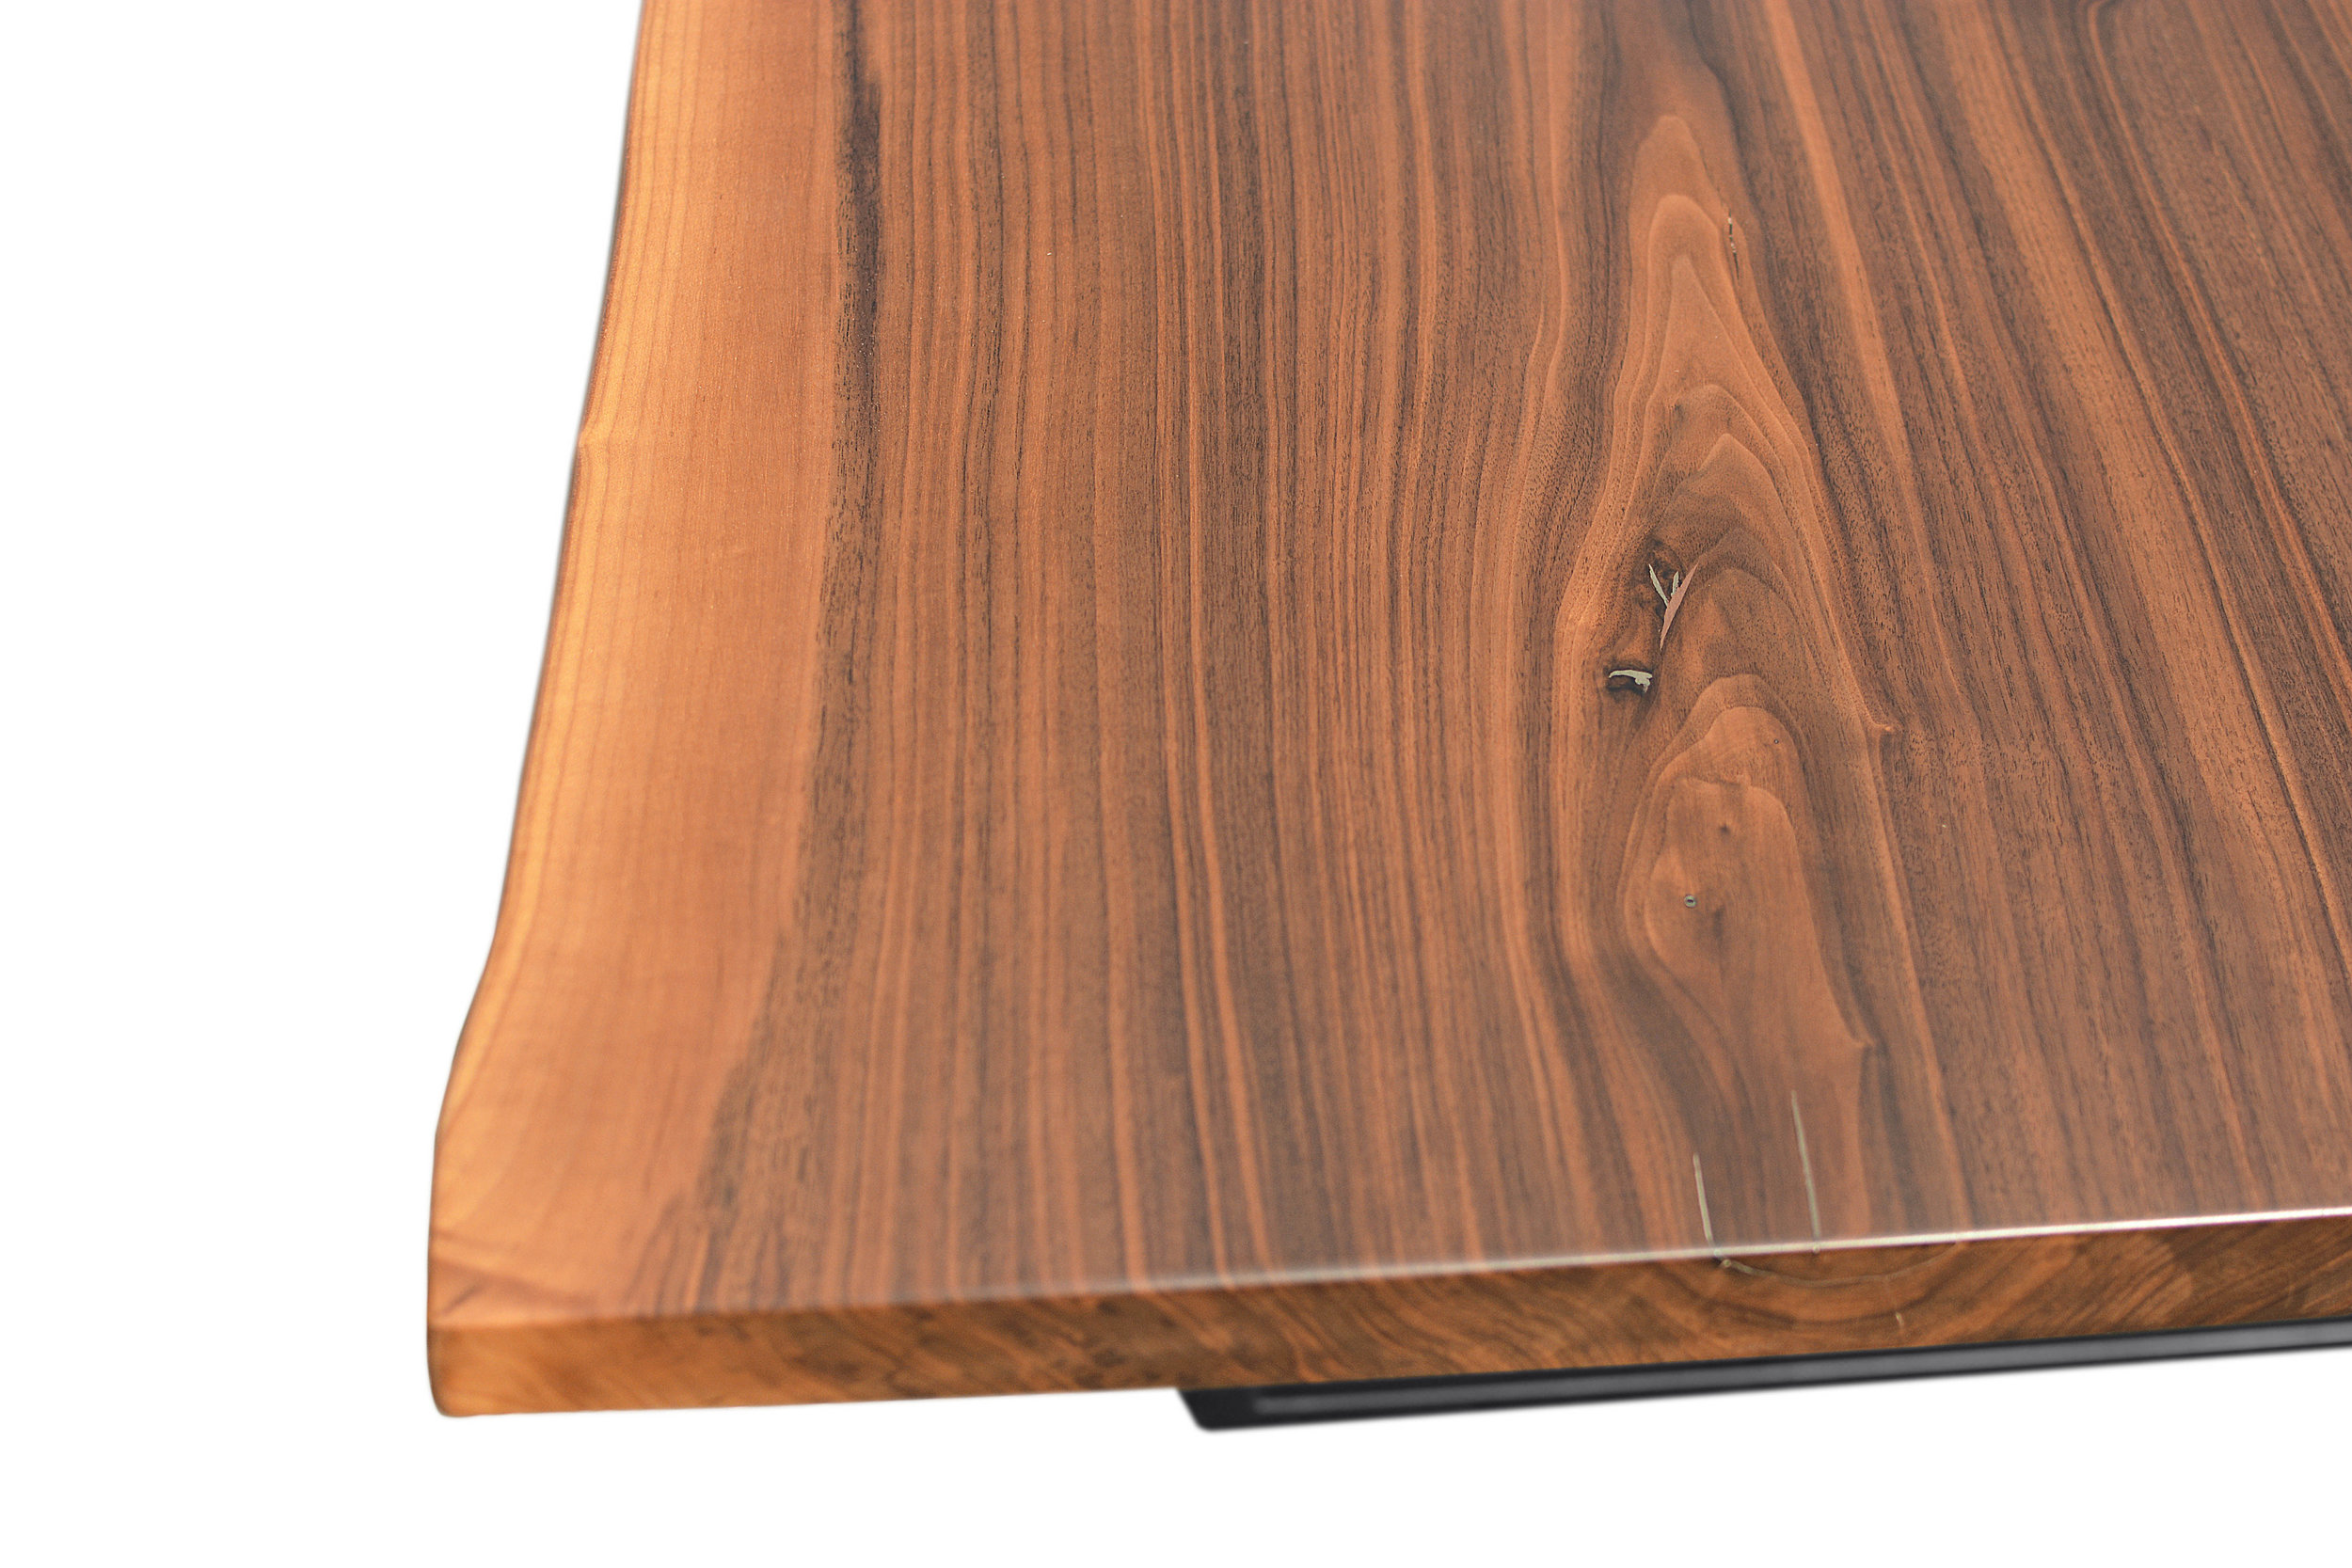 Etz & Steel Hermes Live Edge Walnut Table Close Up 7.JPG